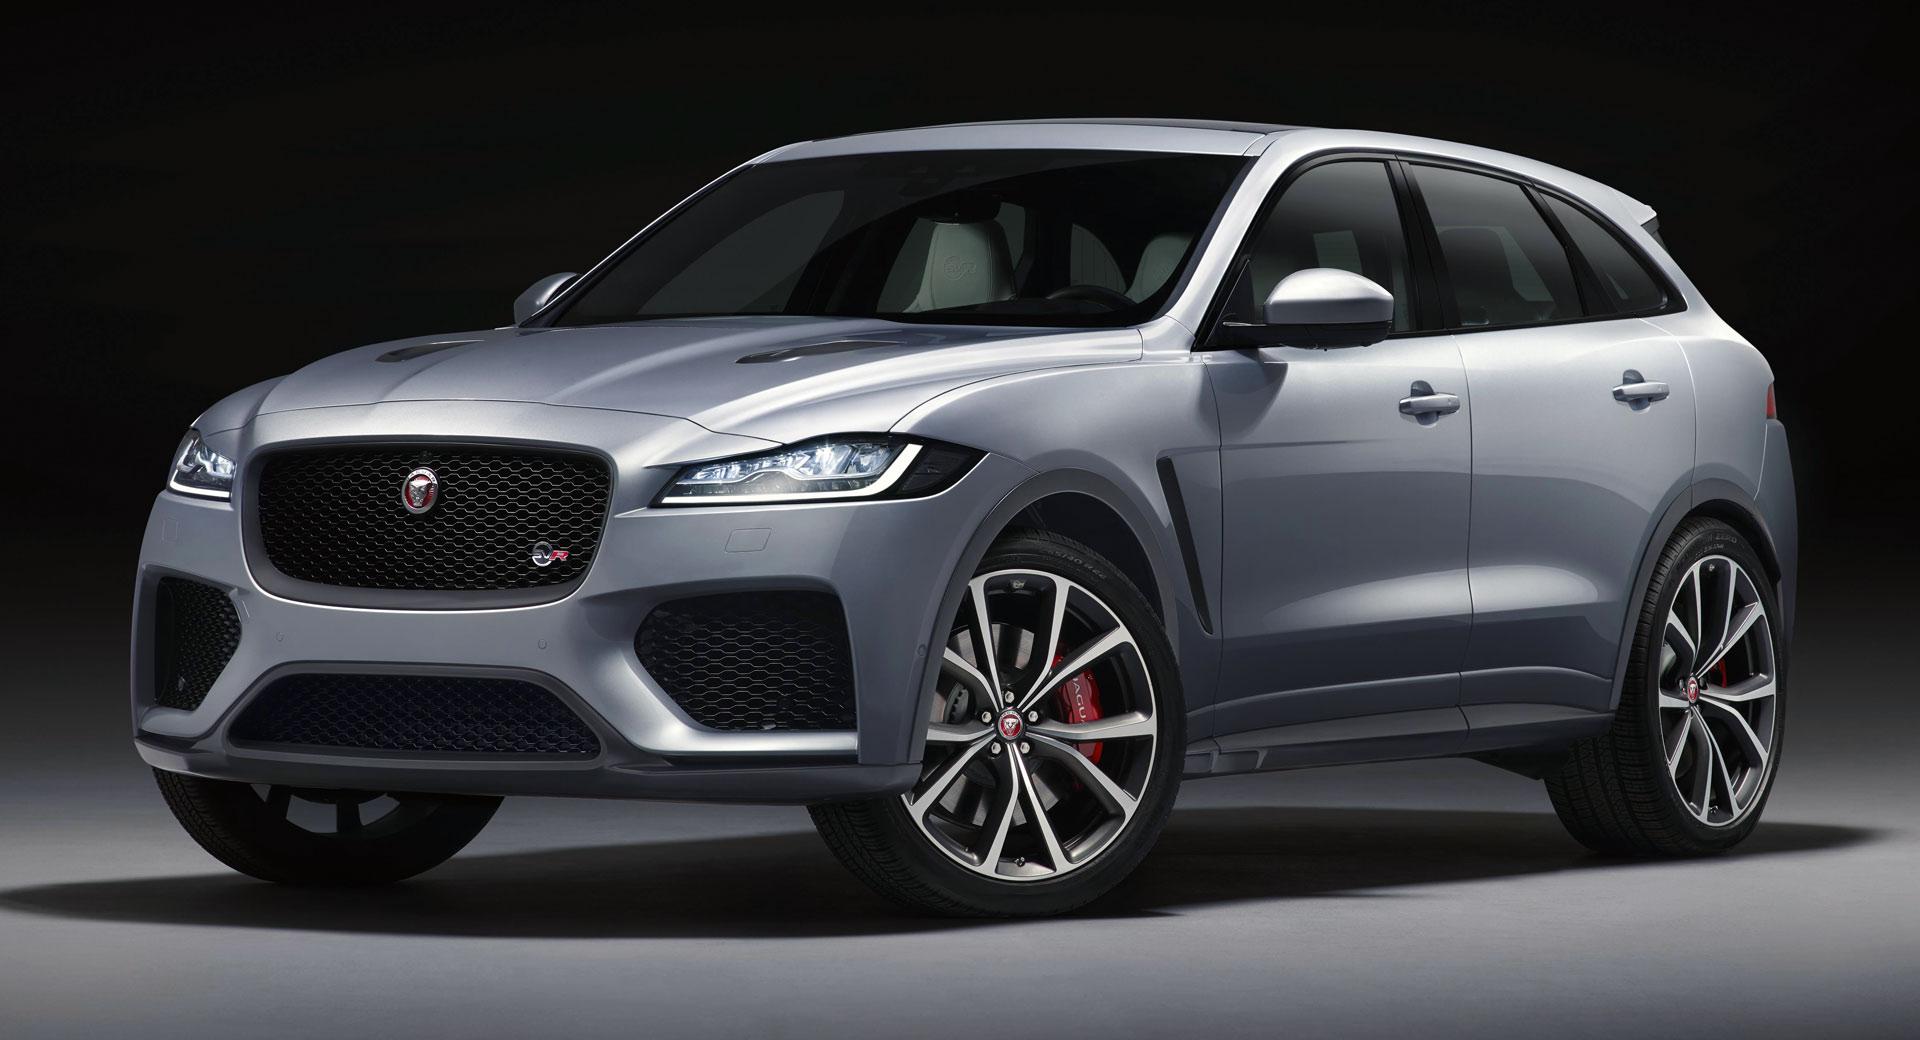 2019-Jaguar-F-Pace-SVR-1-1.jpg